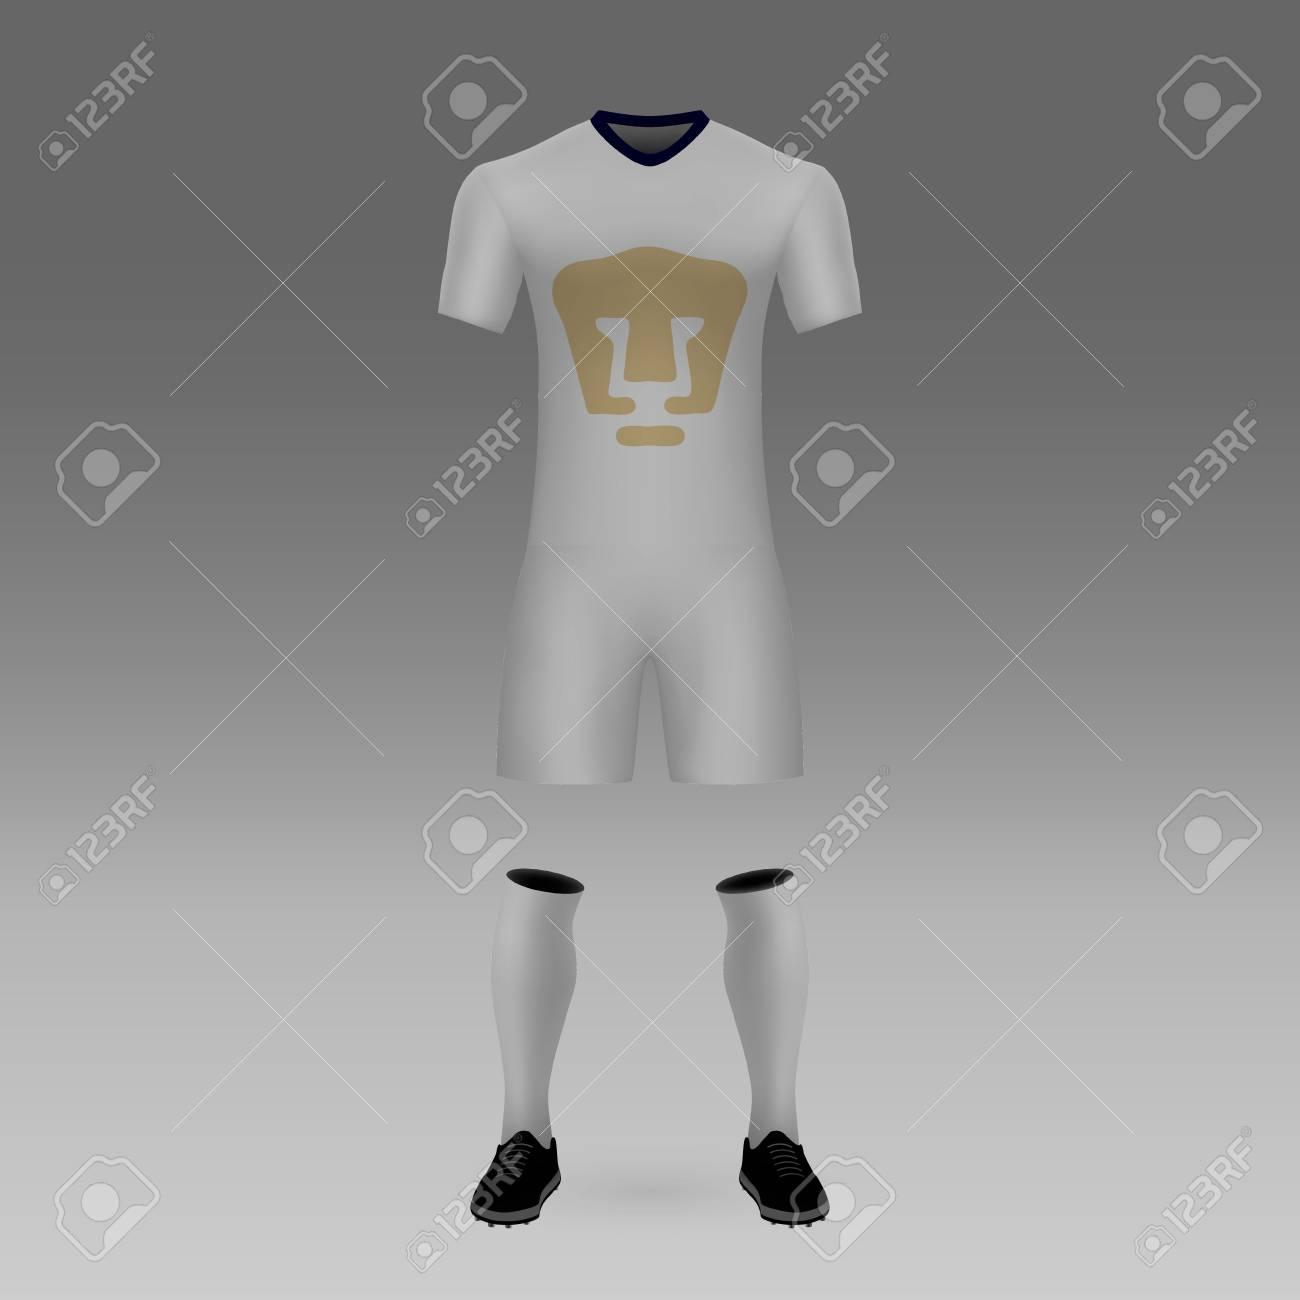 wholesale dealer a3912 72b00 football kit UNAM Pumas, shirt template for soccer jersey. Vector..